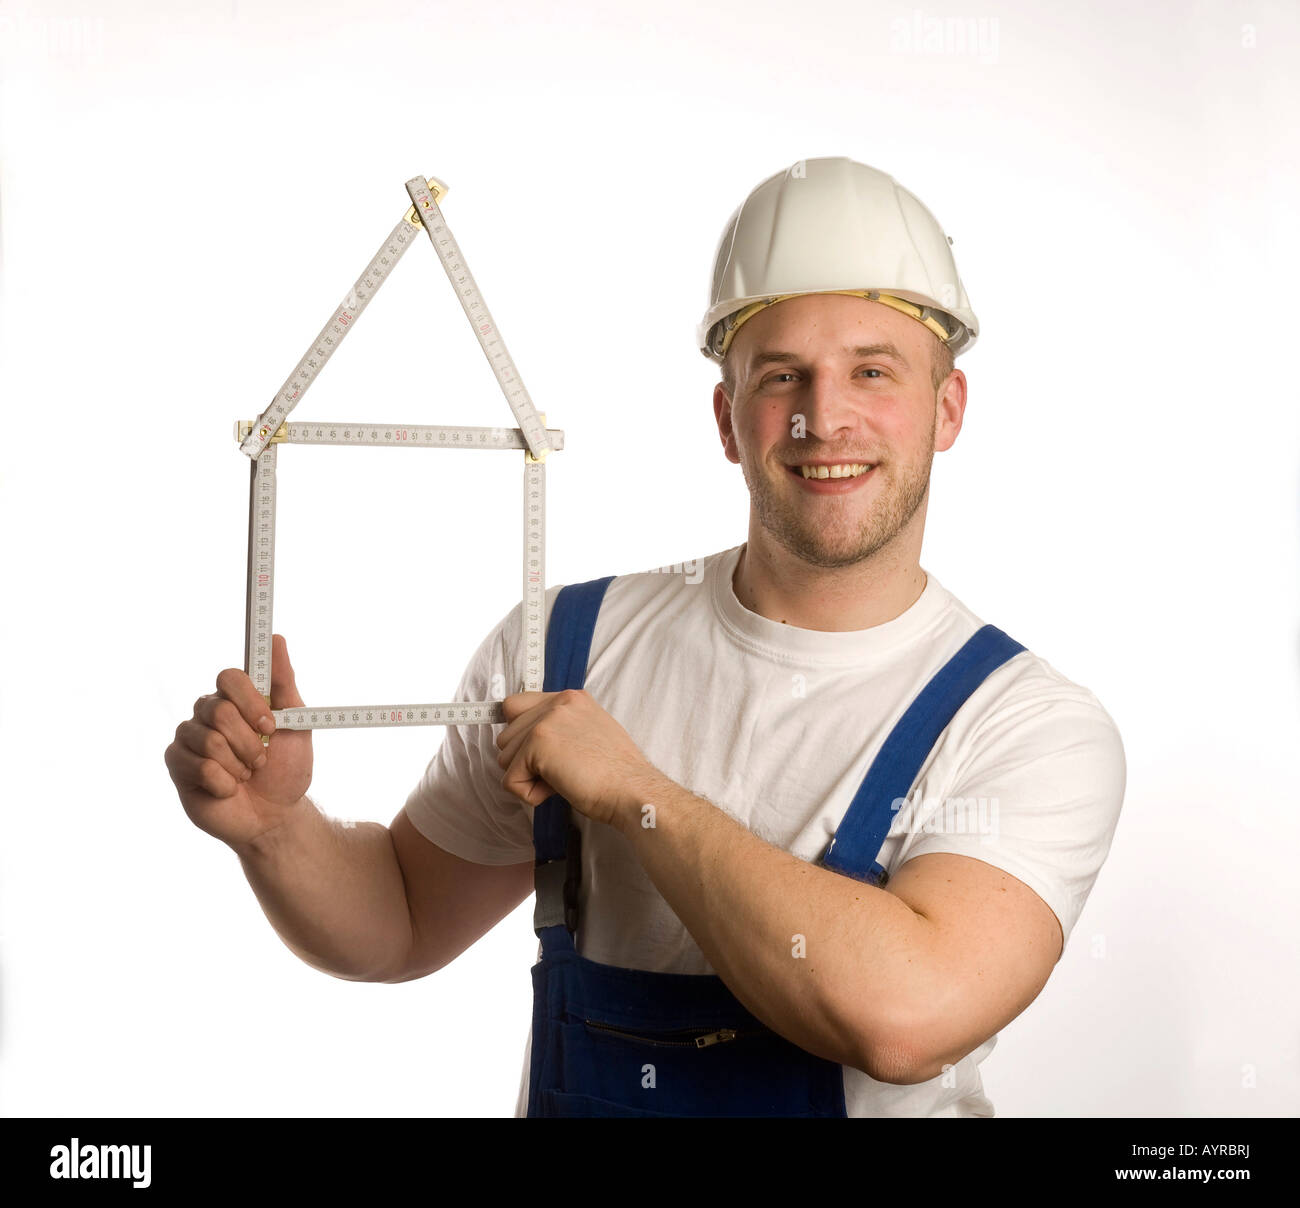 Bauarbeiter mit Zollstock (Maßstab) Stockbild